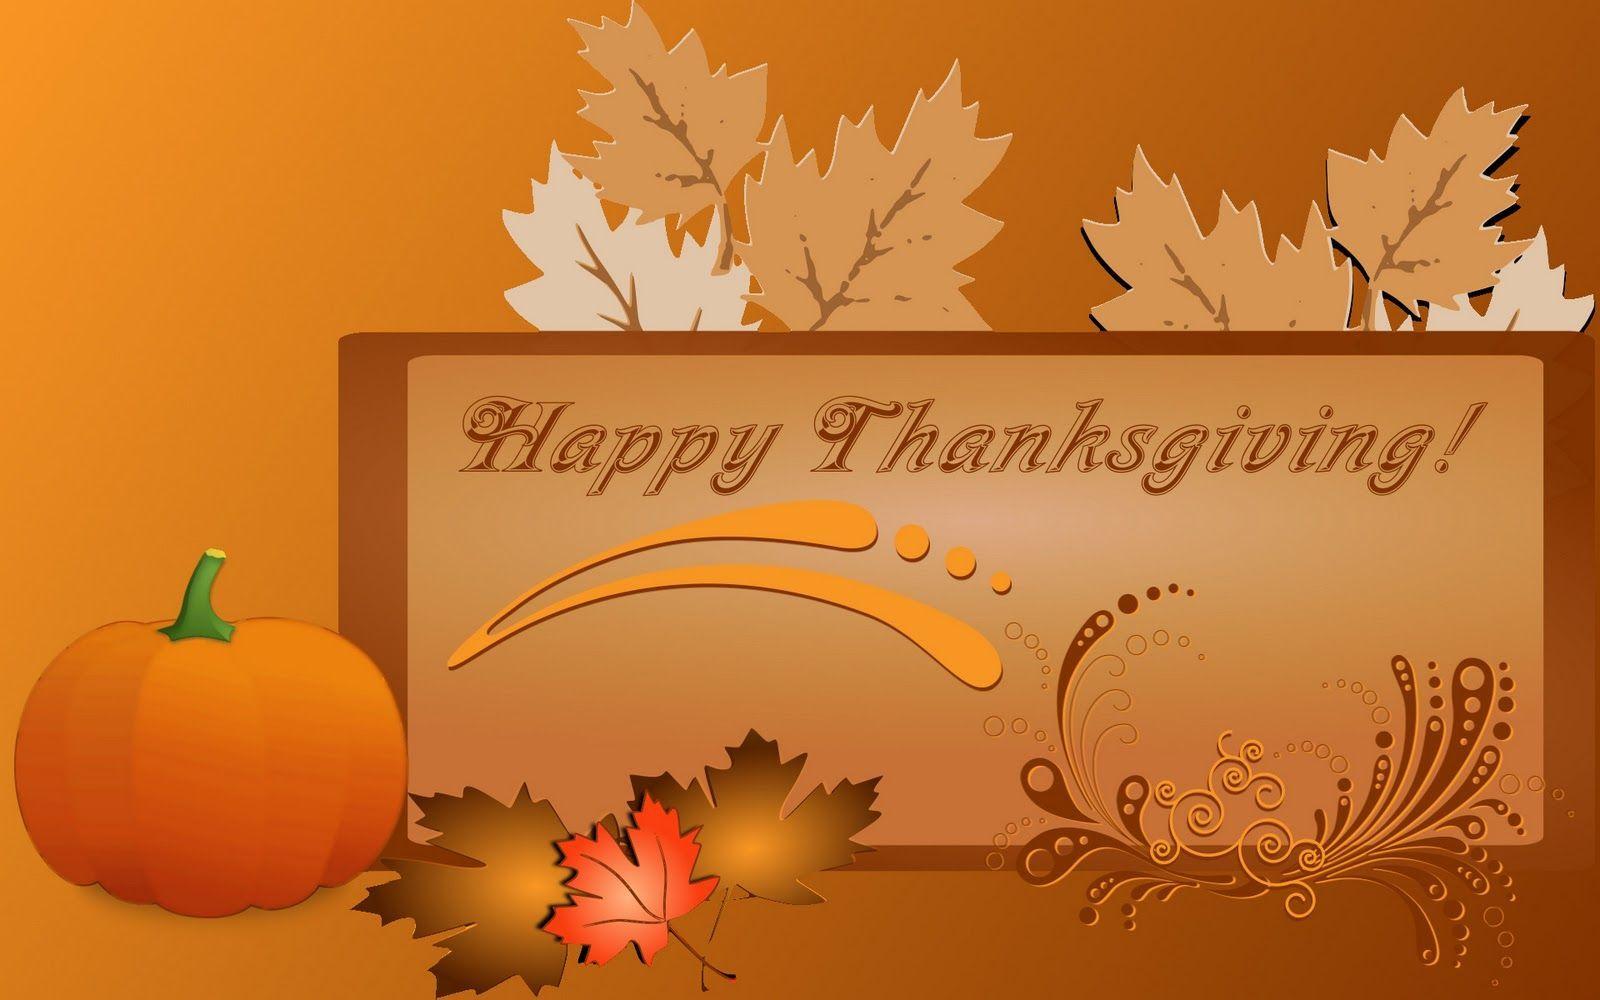 Desktop Wallpaper For Thanksgiving 1600x1000 1600x1000